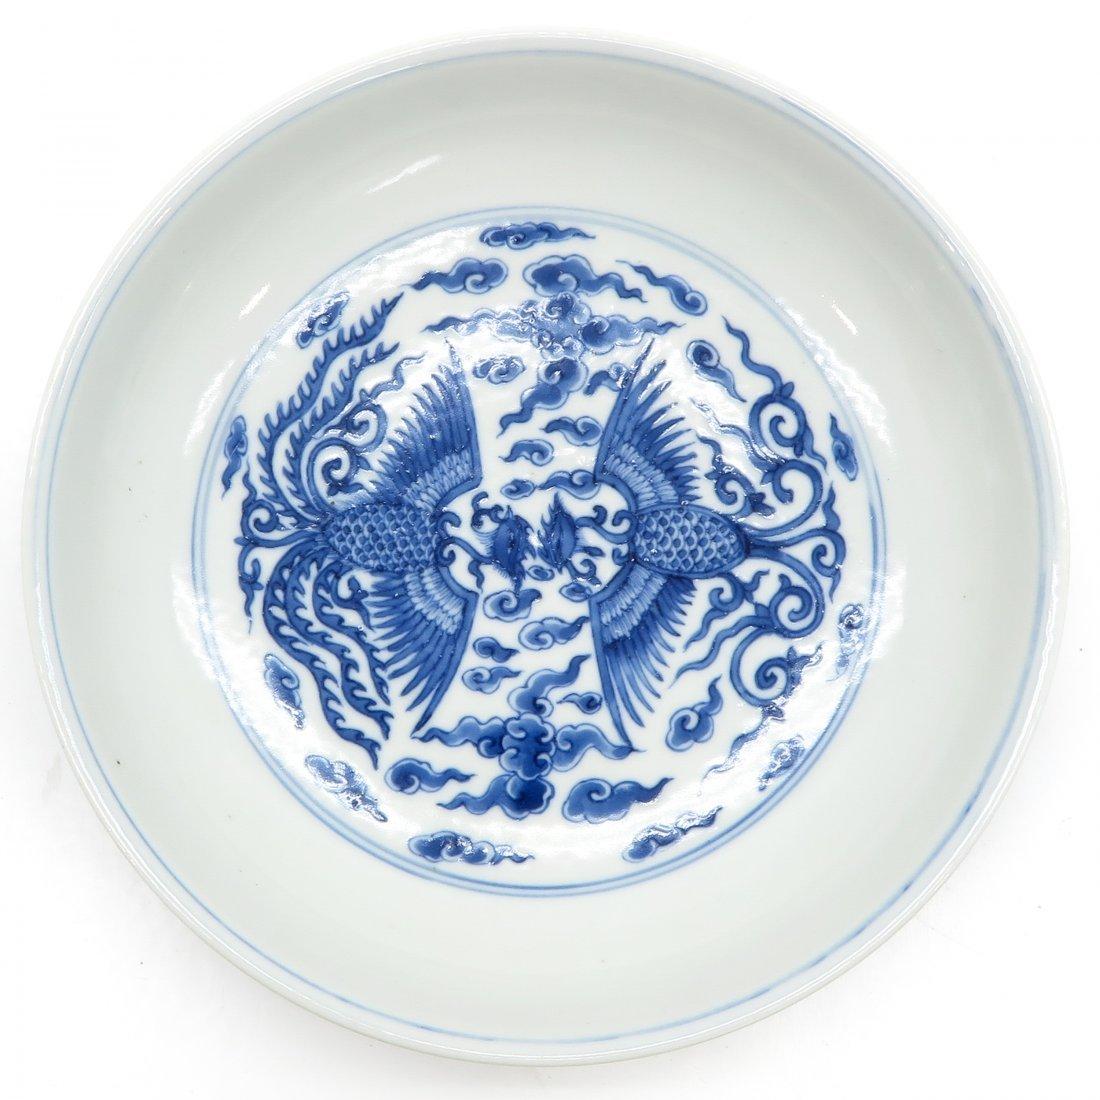 China Porcelain Tongzhi Period Bowl